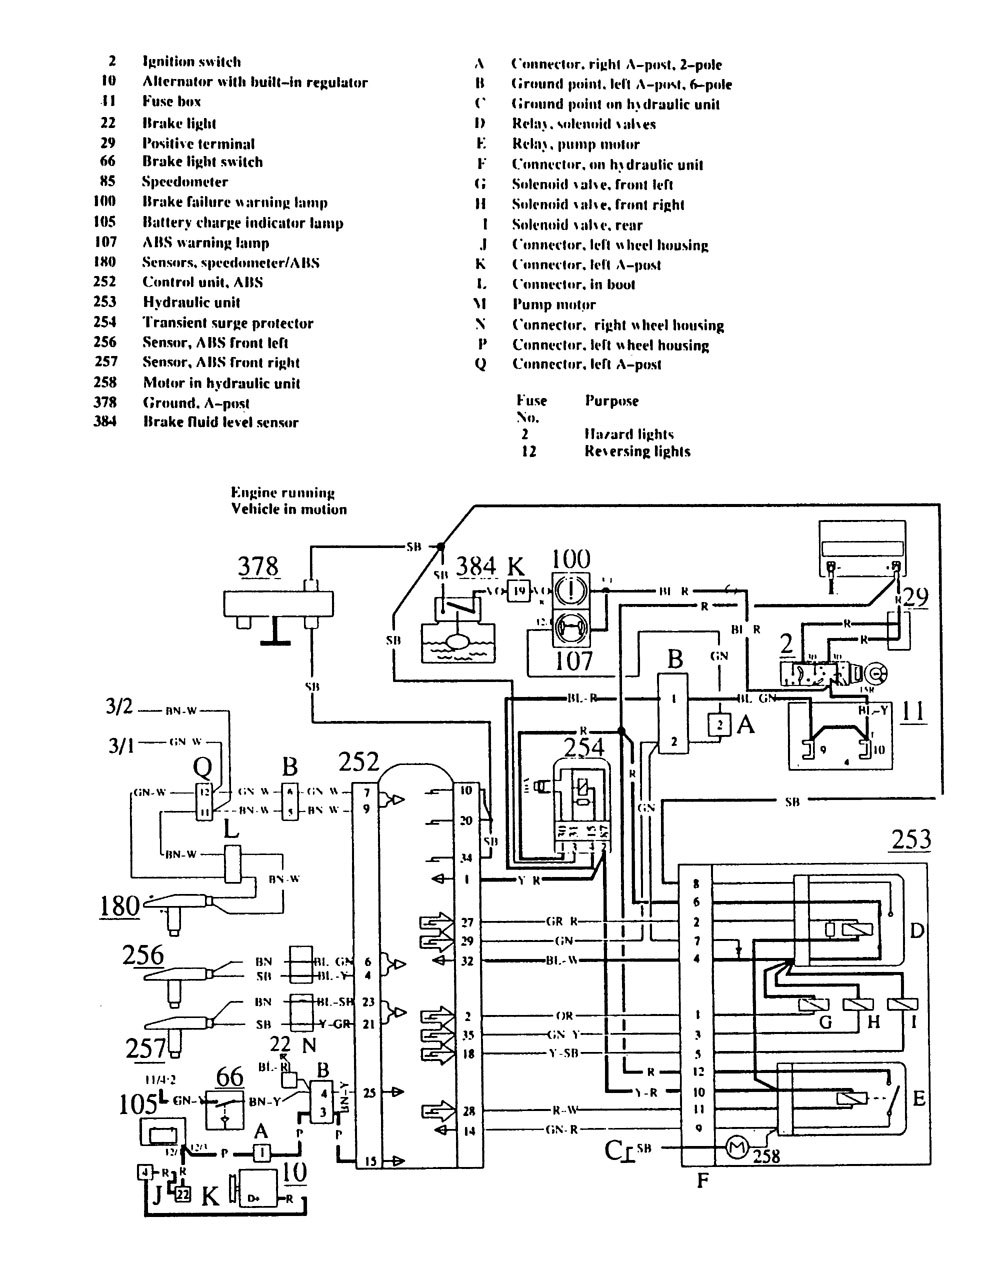 2000 jeep grand cherokee brake light wiring diagram stewart warner fuel gauge volvo 240 library ignition house symbols u2022 1993 radio